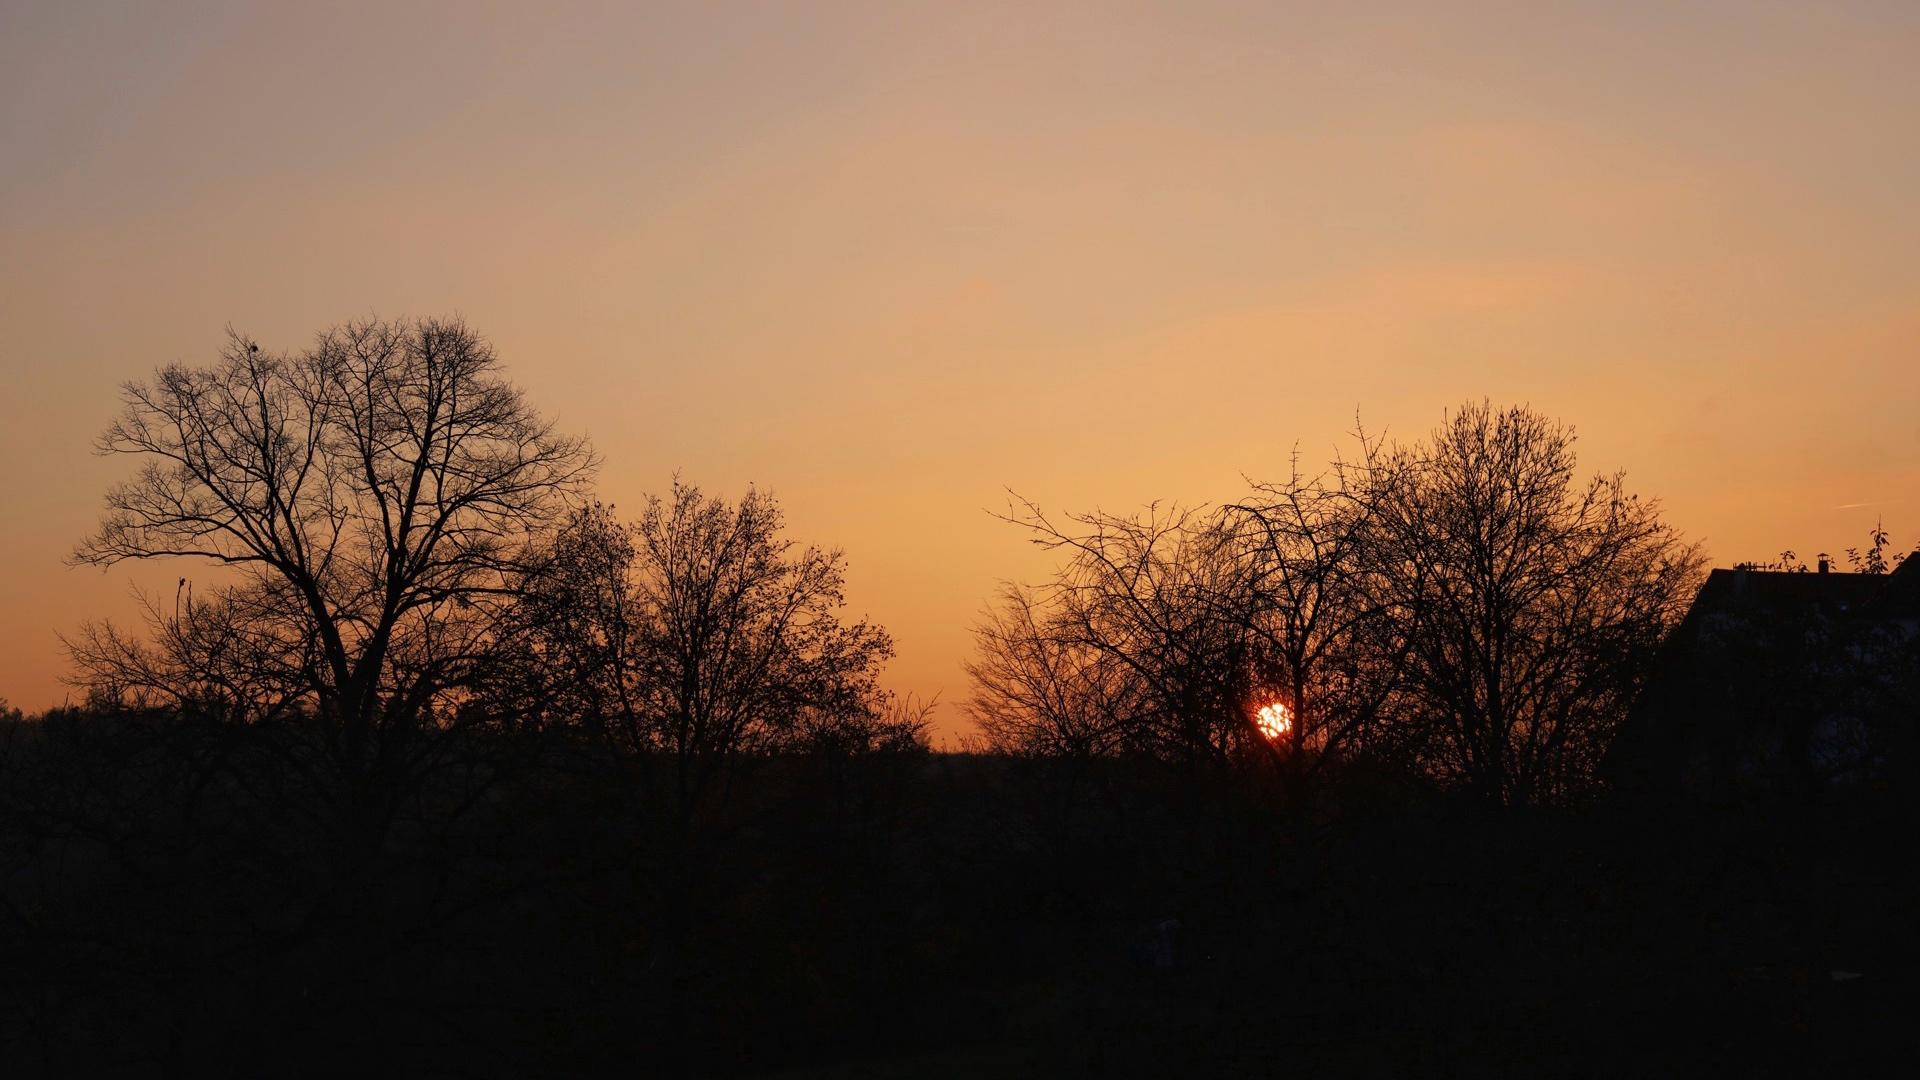 Letzte Sonne 2